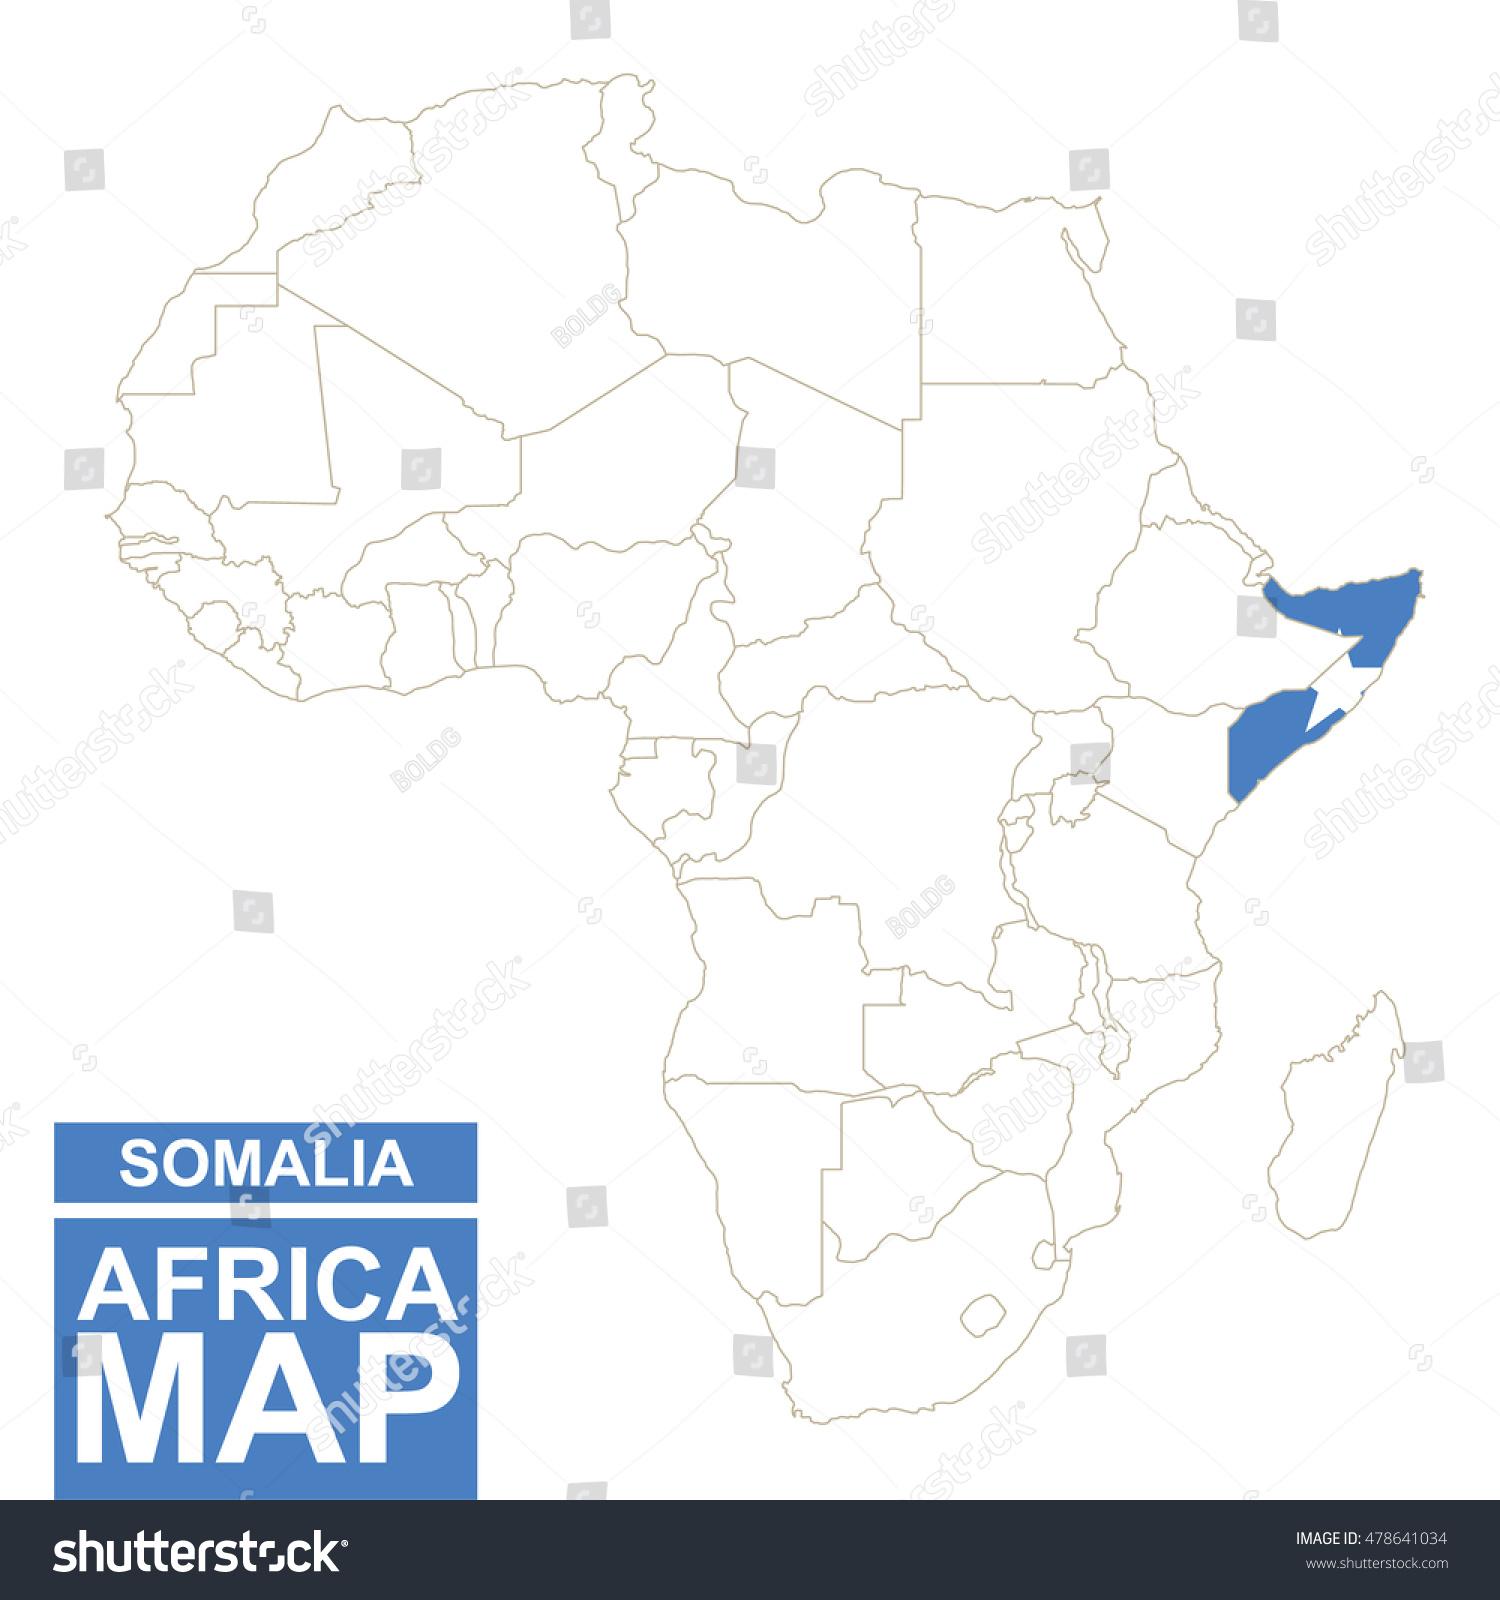 Somalia on africa map what is rail transportation hvac symbol somalia map africa automatic irrigation system diagram stock photo africa contoured map with highlighted somalia somalia sciox Images